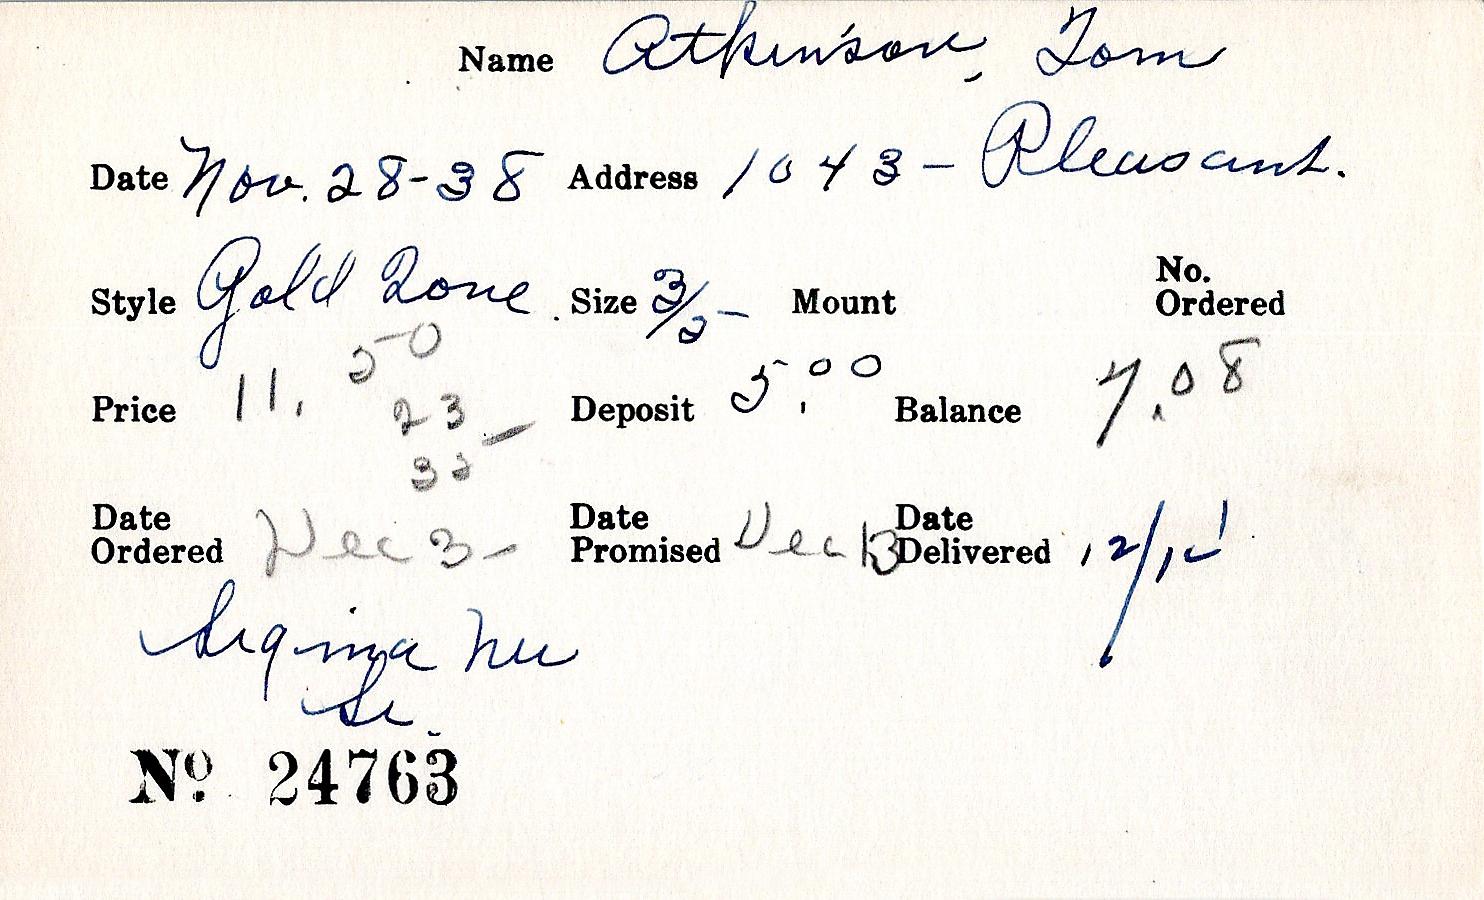 Index card for Tom Atkinson